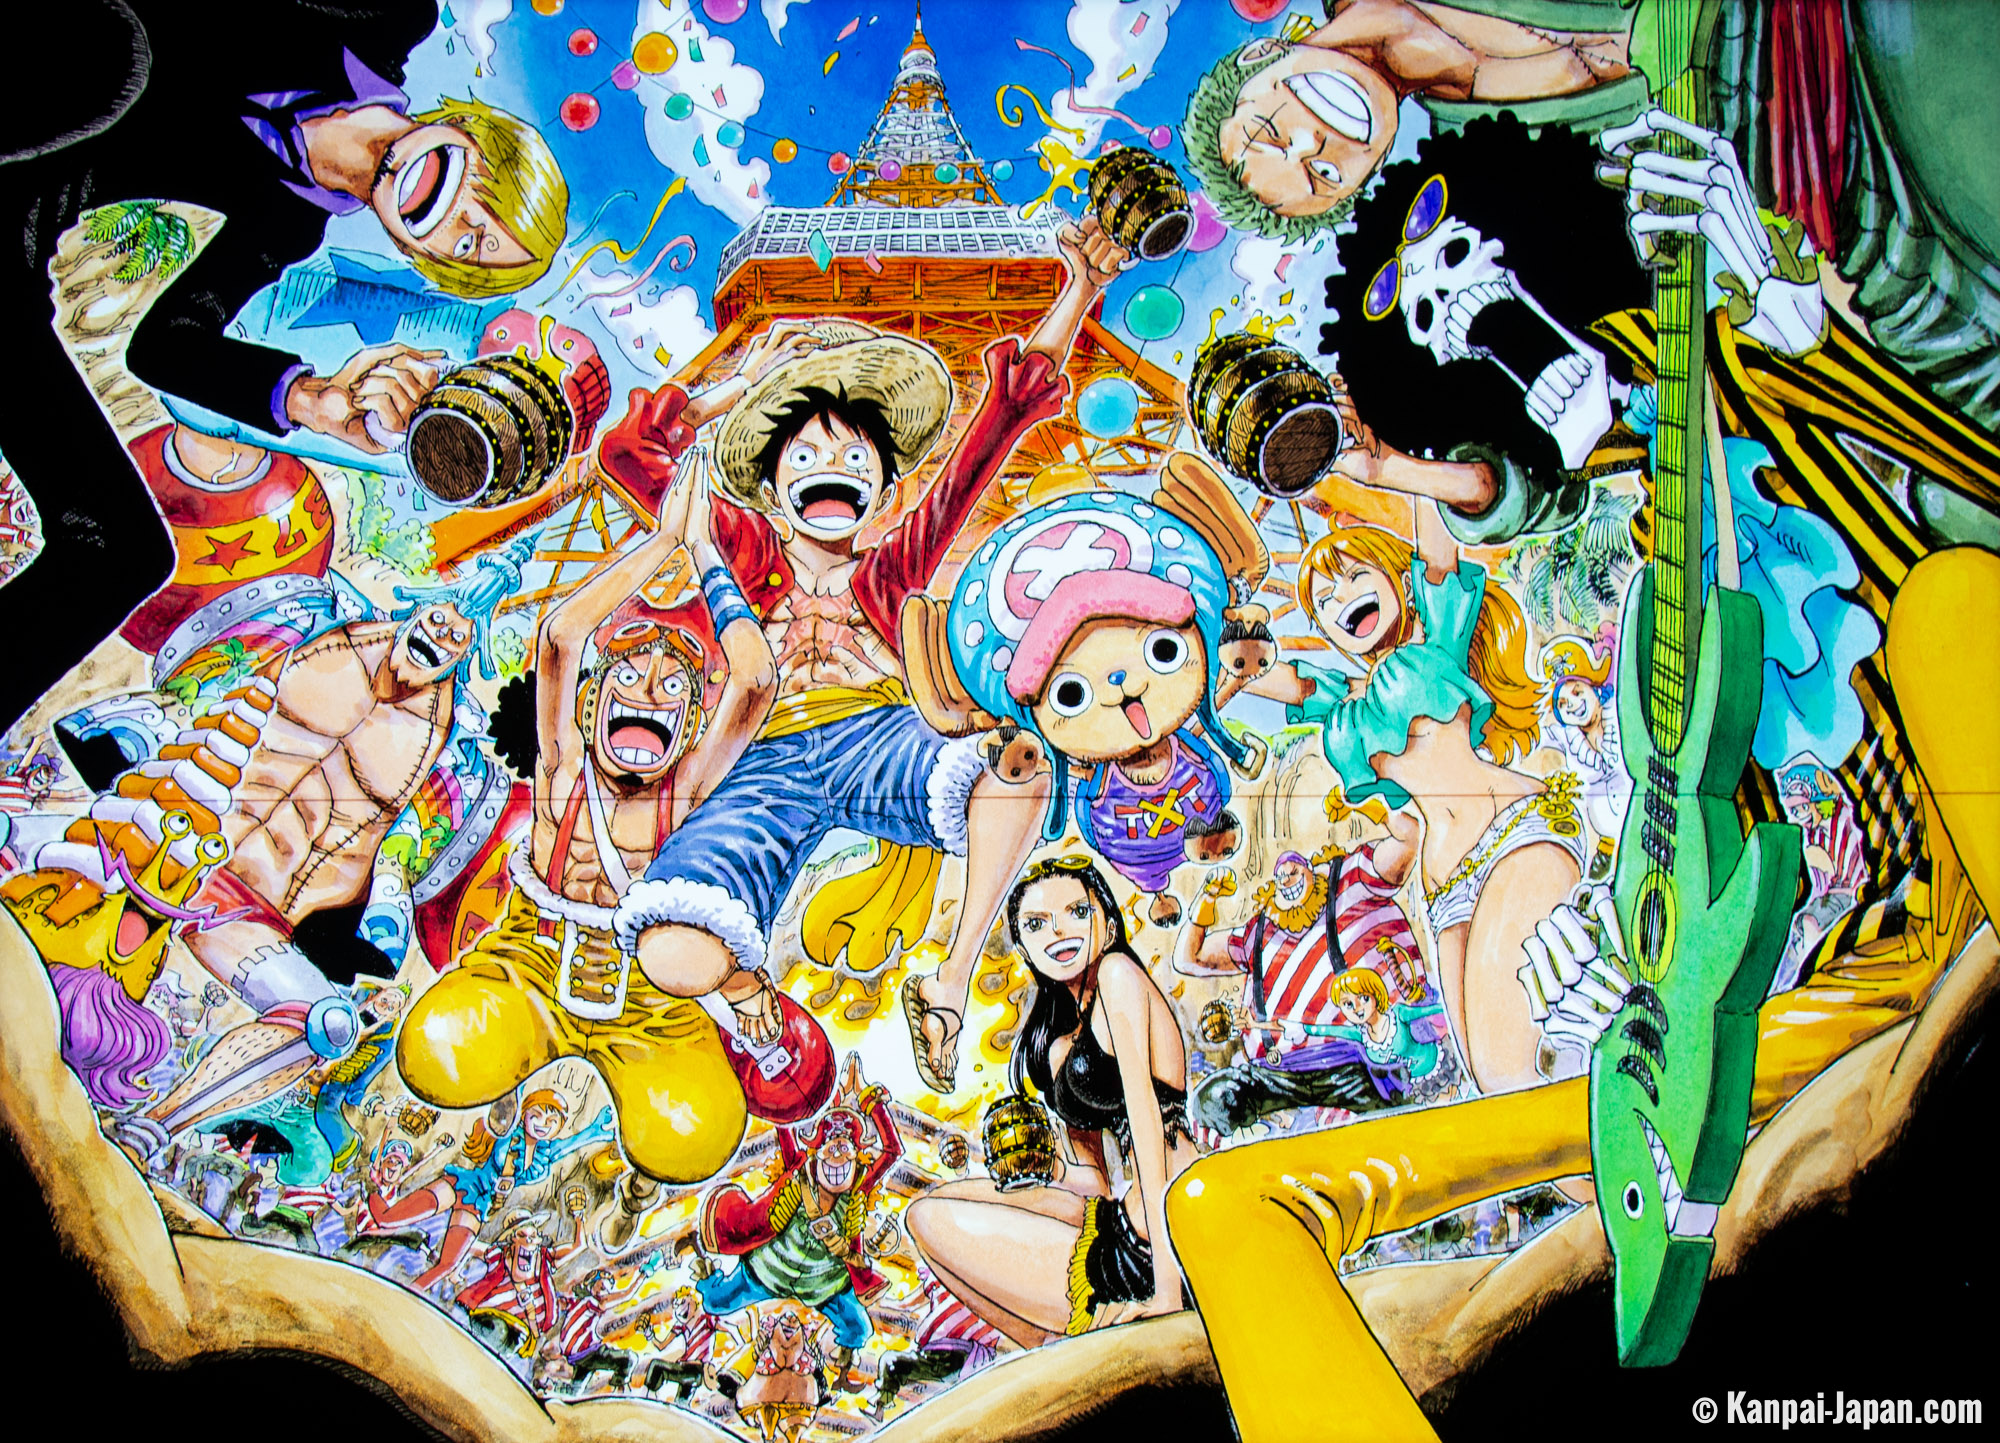 Tokyo One Piece Tower - The famous pirates' crew amusement park